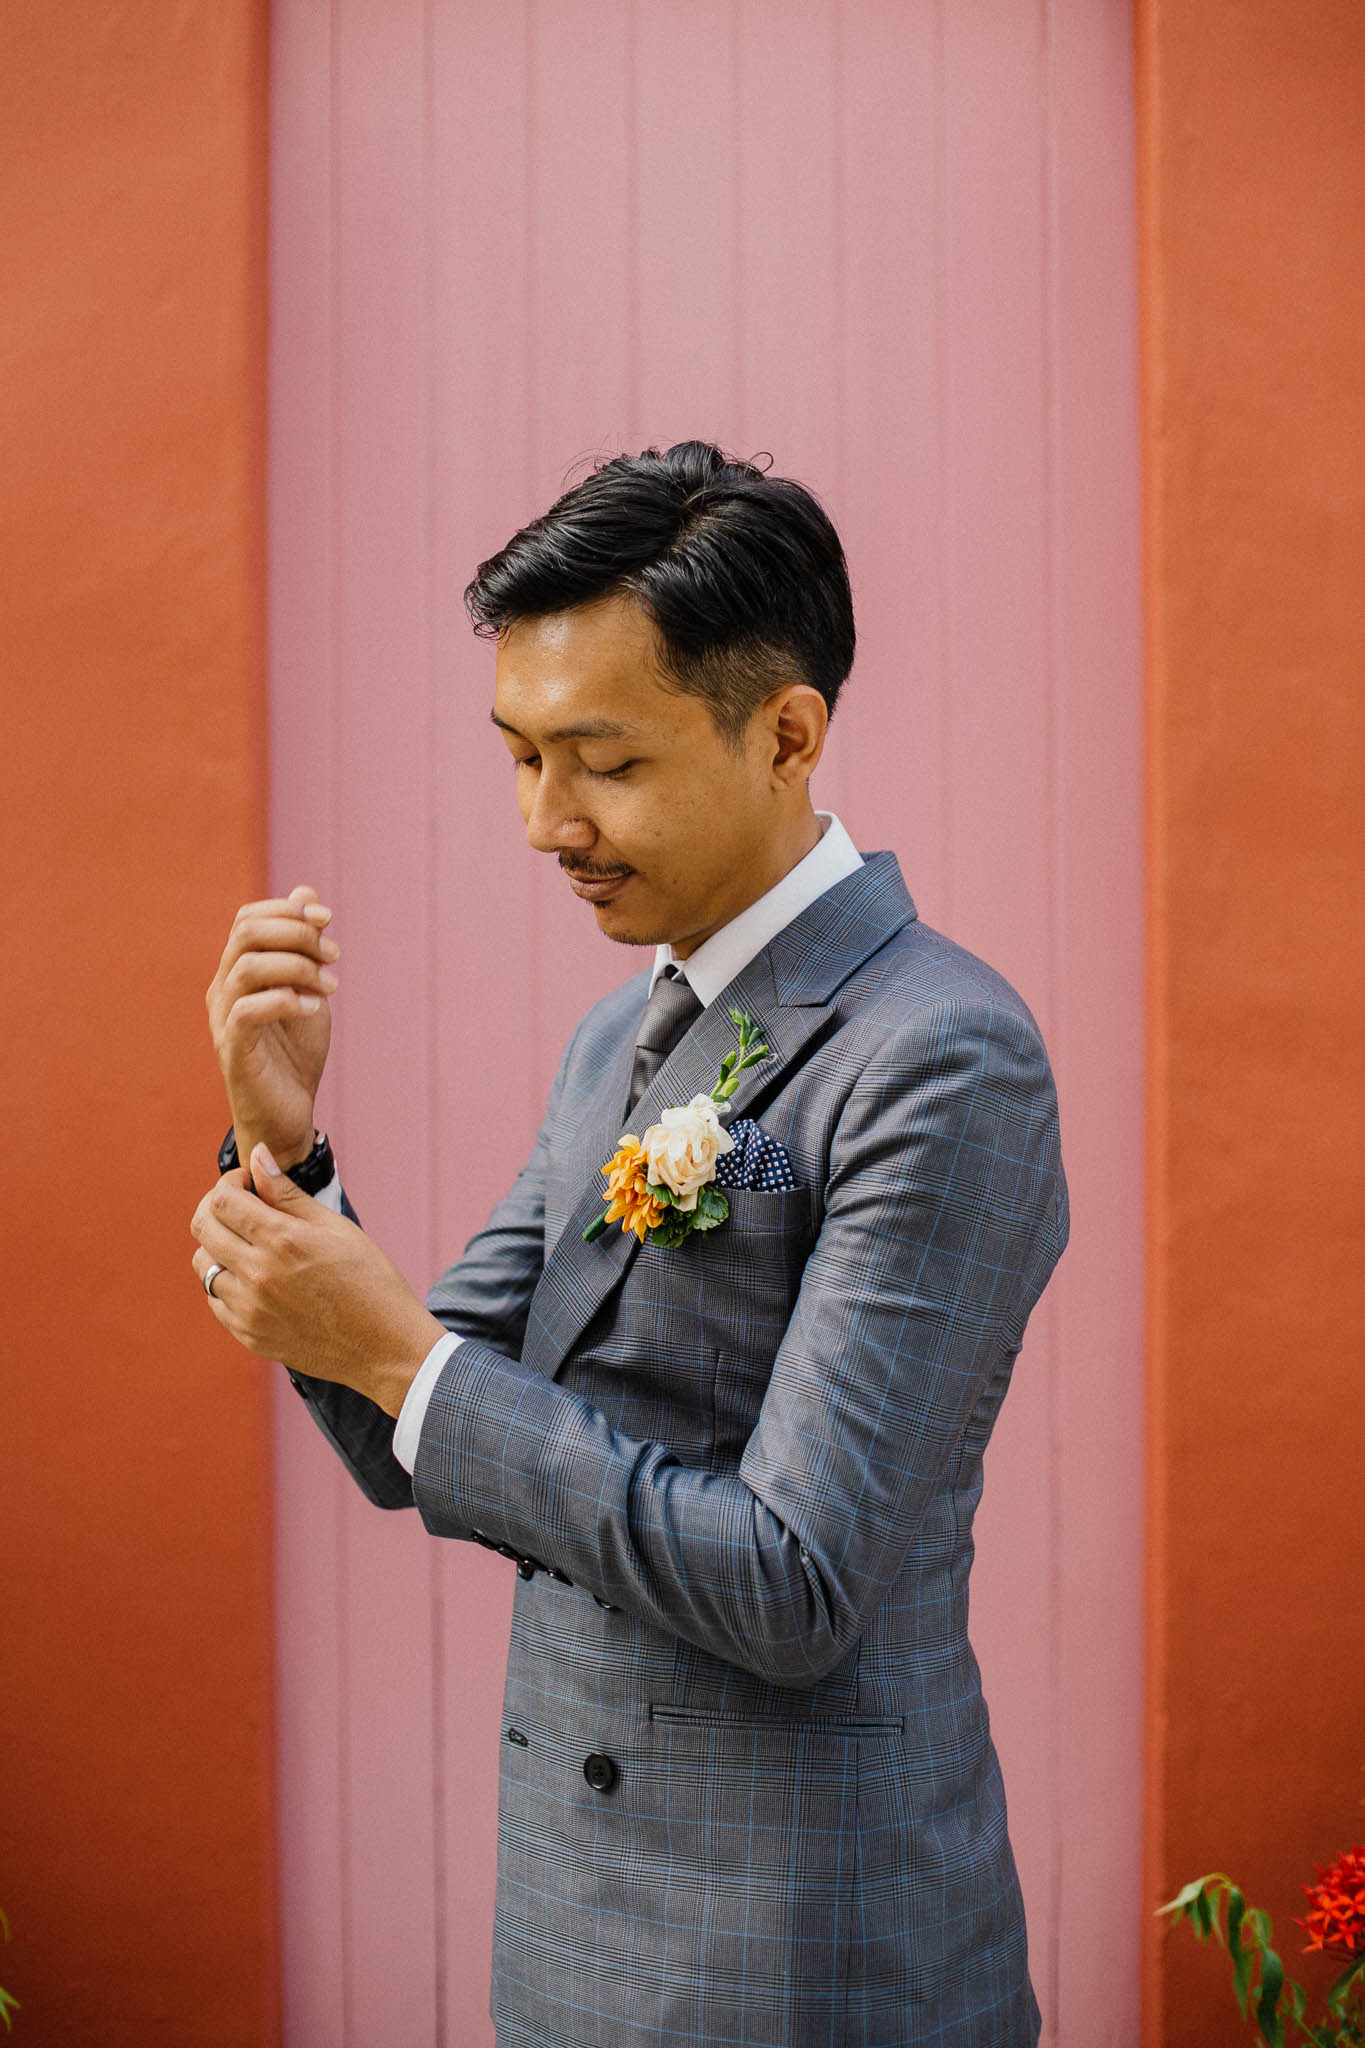 singapore-wedding-photographer-addafiq-nufail-081.jpg